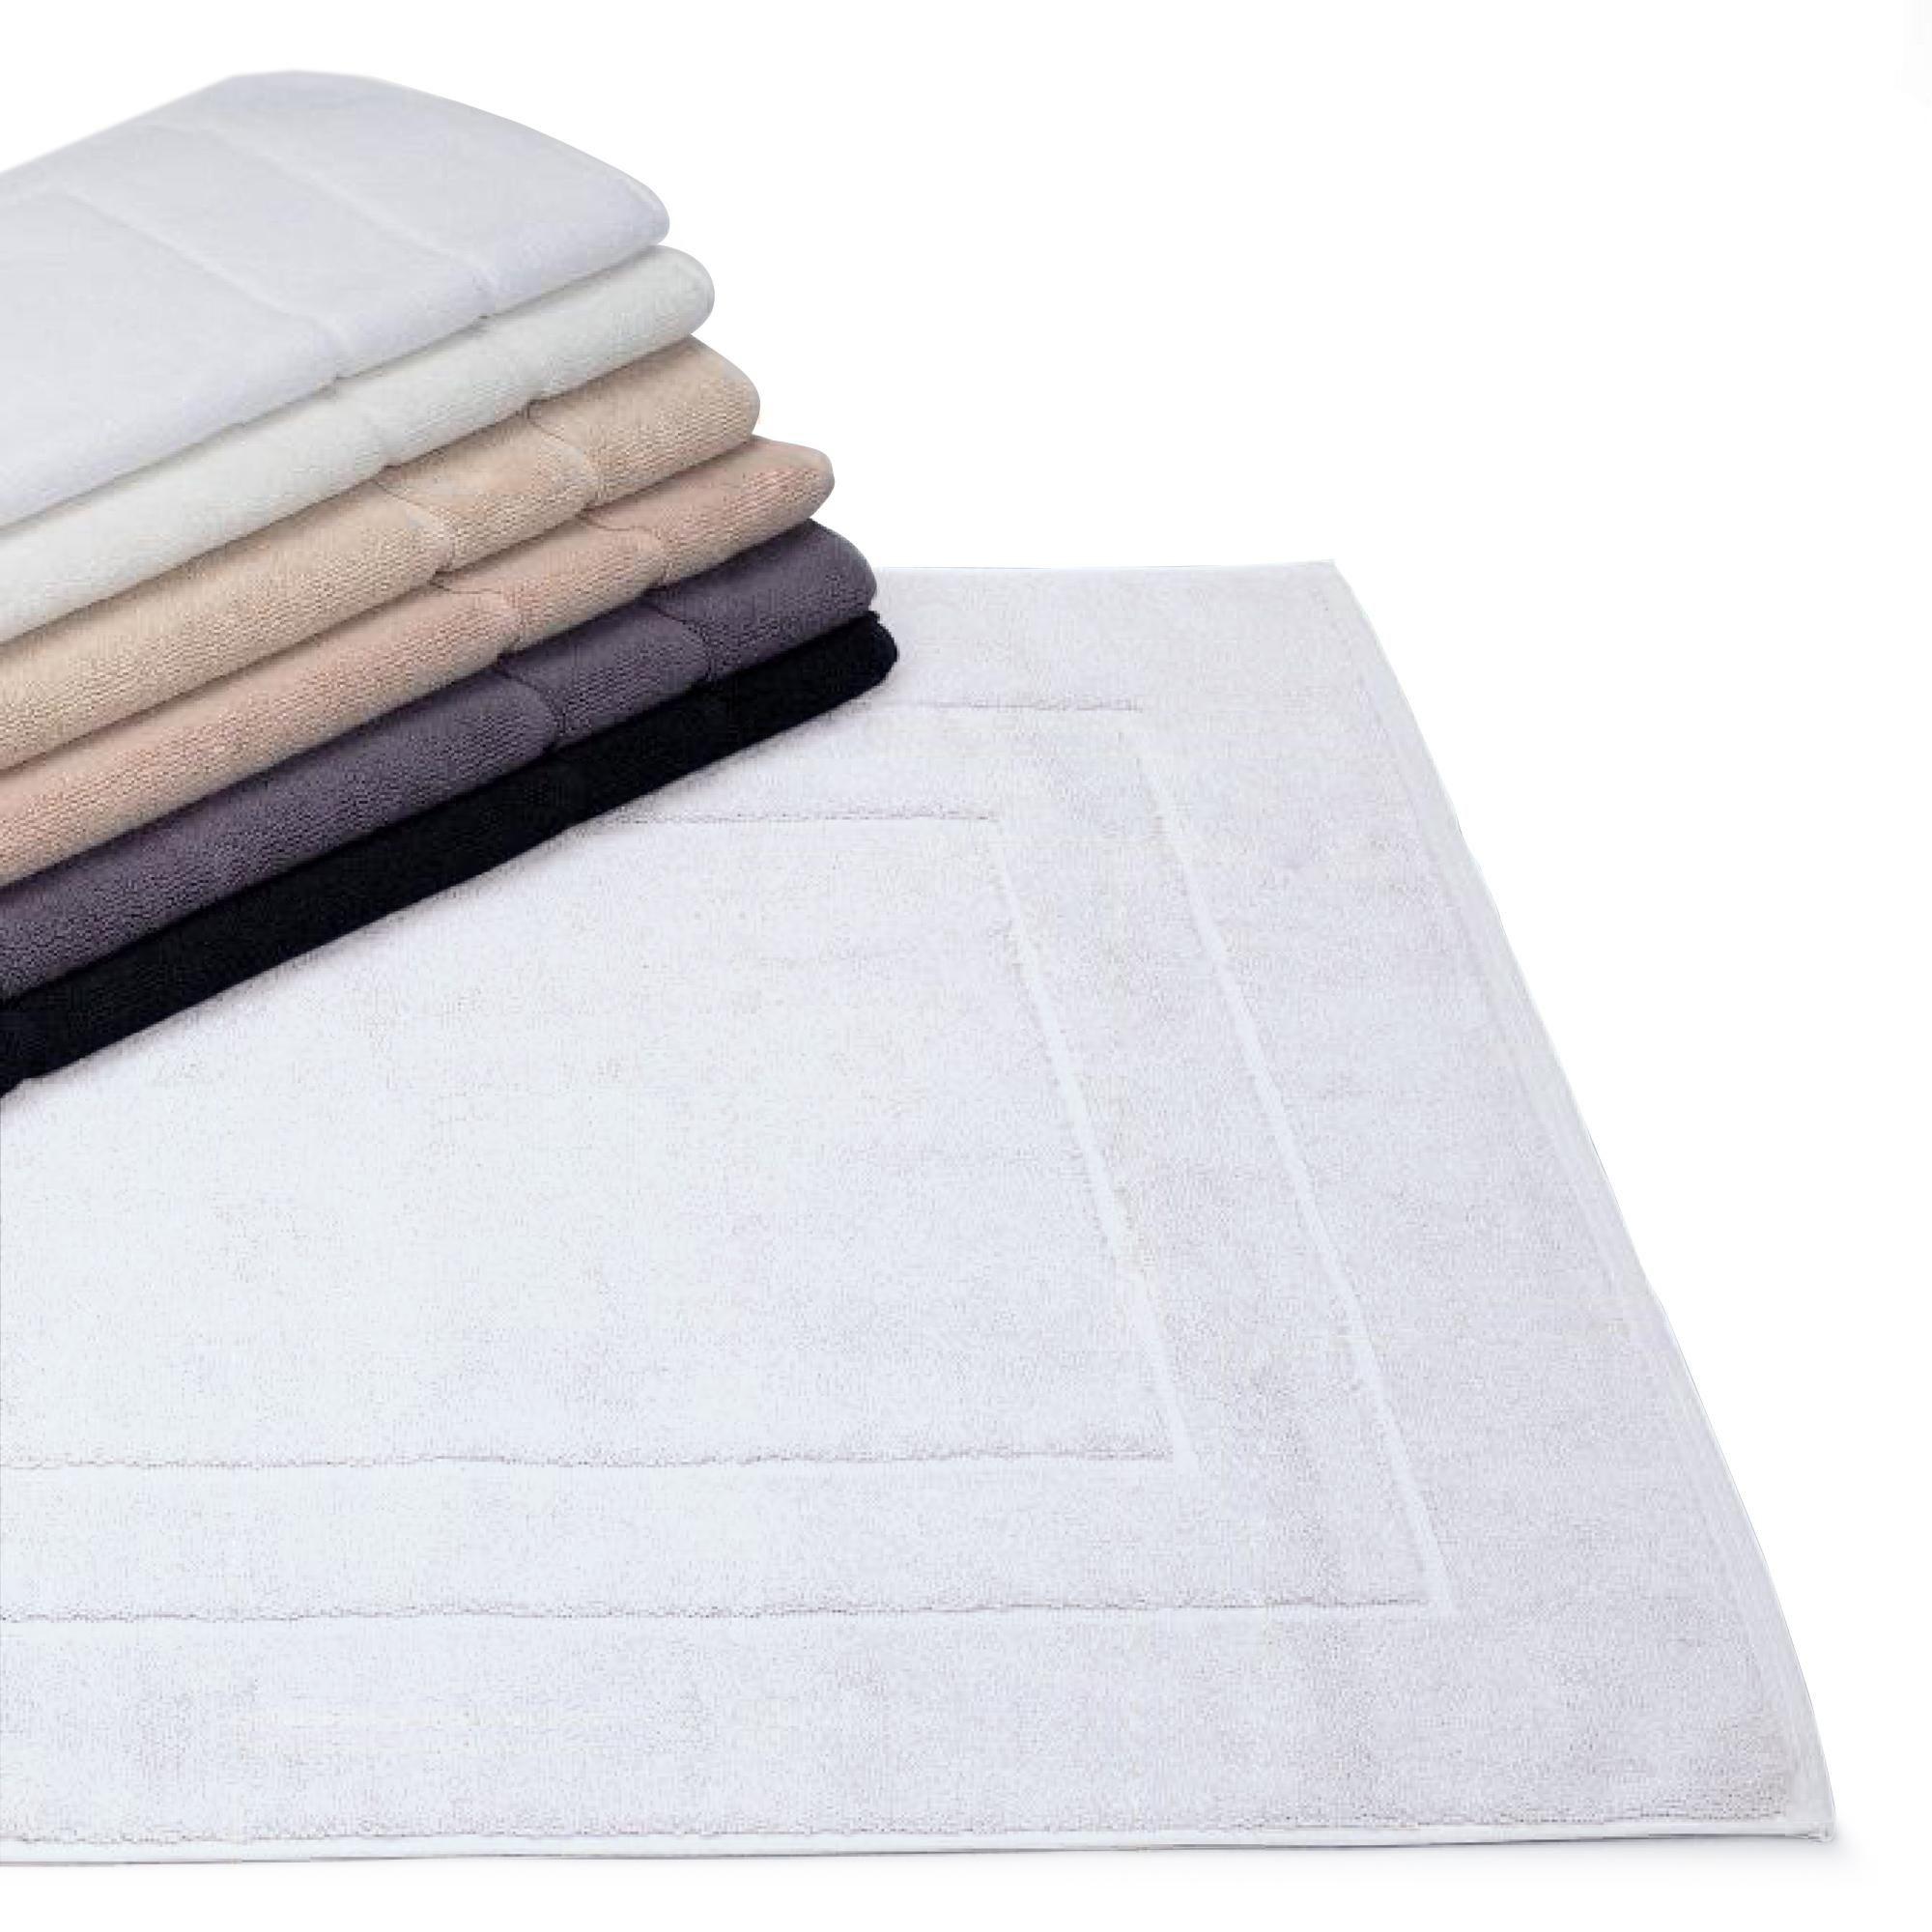 tapis de bain 60x60 cm flair blanc 1500 g m2 achat. Black Bedroom Furniture Sets. Home Design Ideas